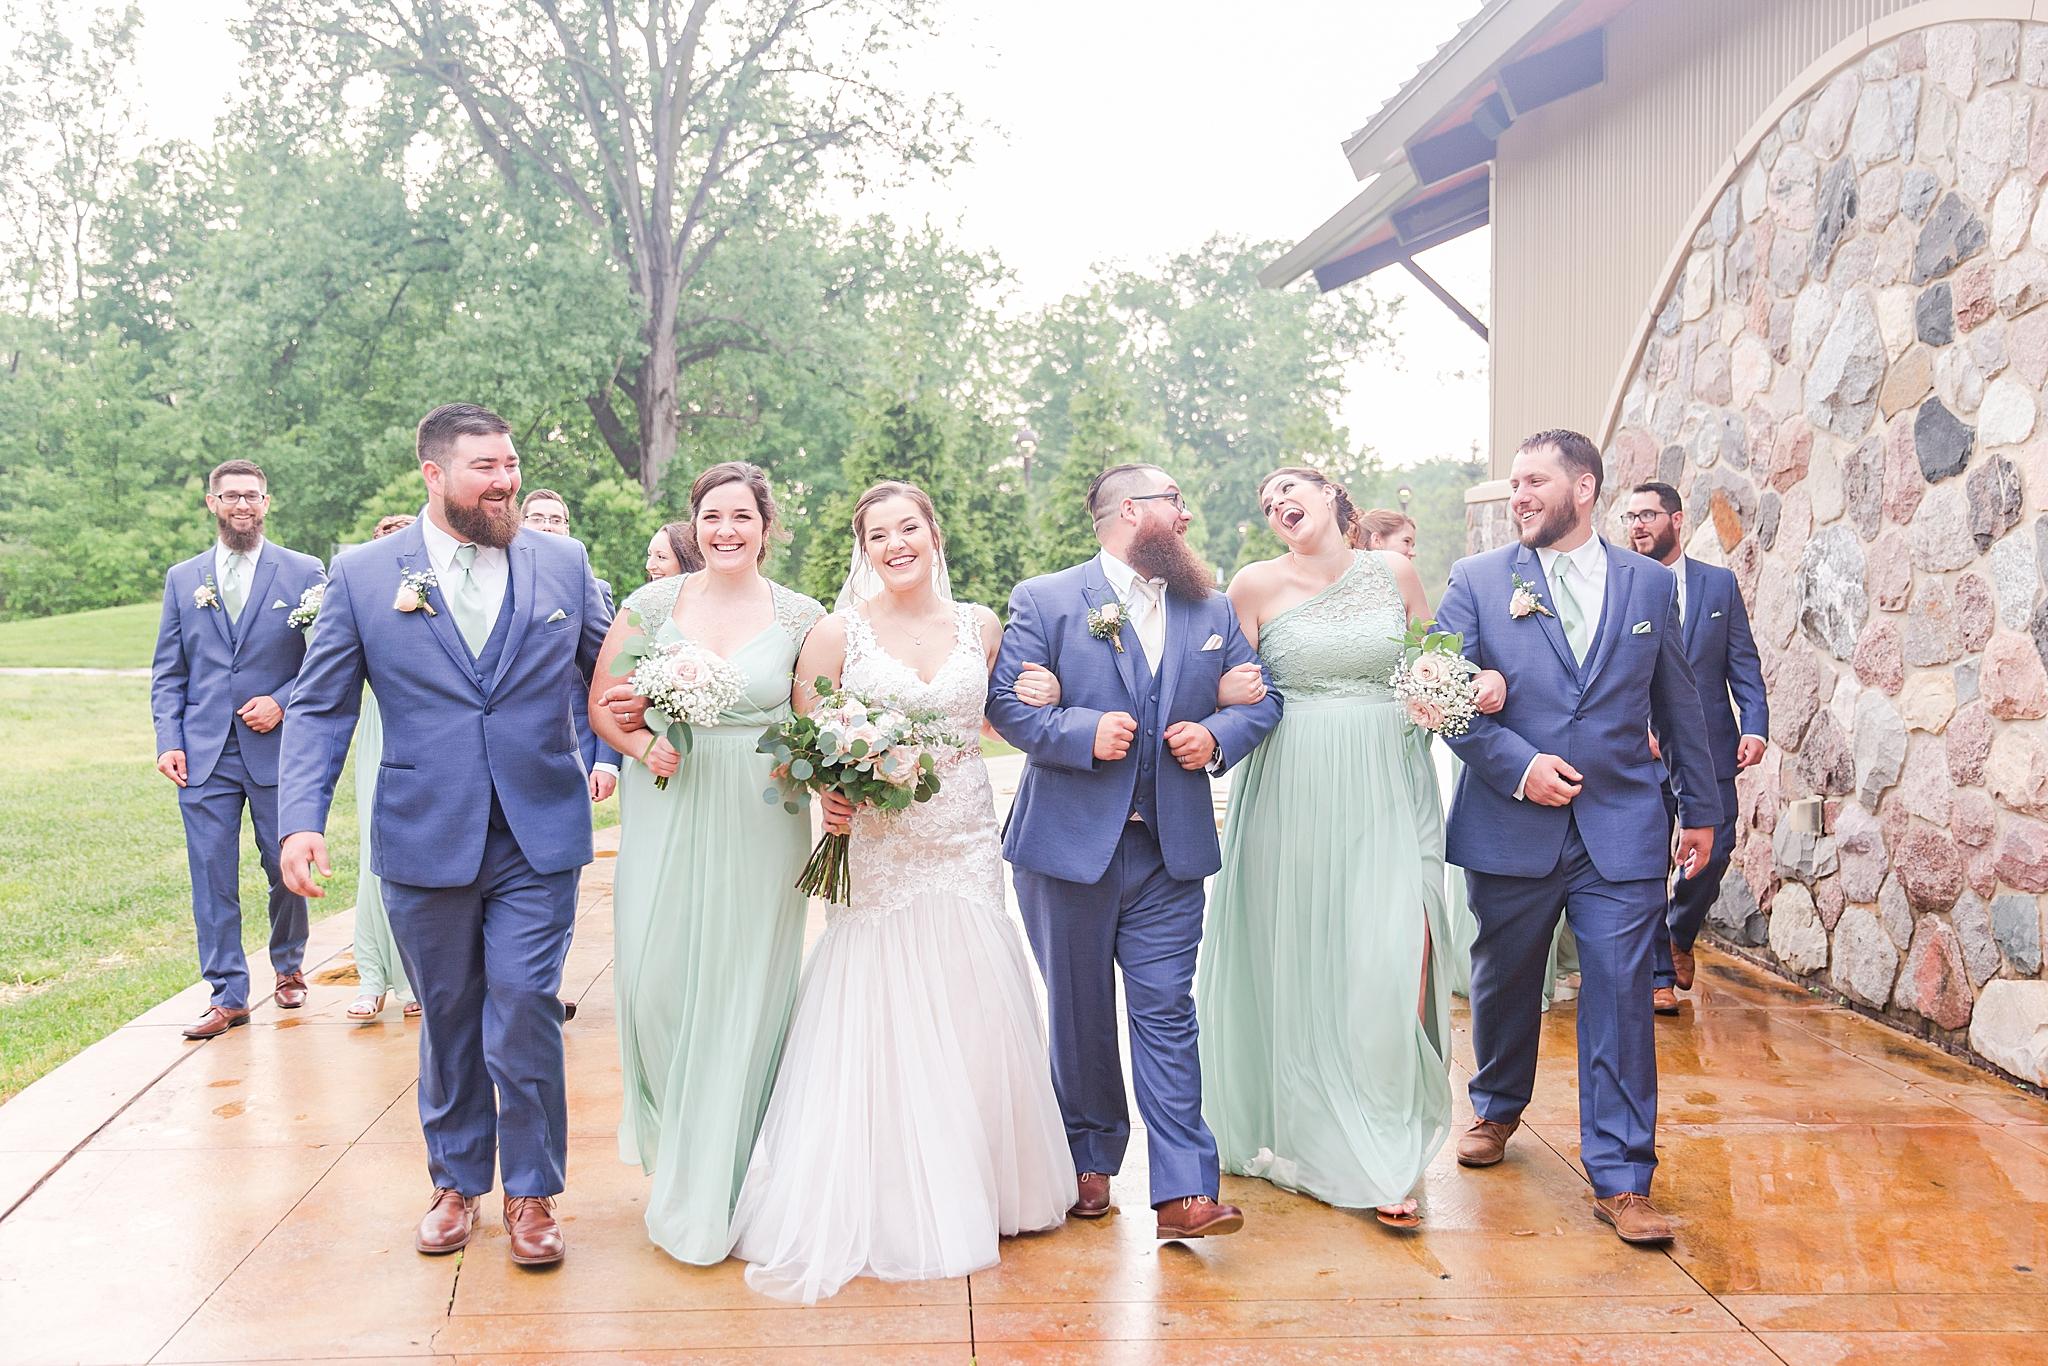 detroit-wedding-photographer-brownstown-event-center-wedding-photos-sam-josh-by-courtney-carolyn-photography_0047.jpg